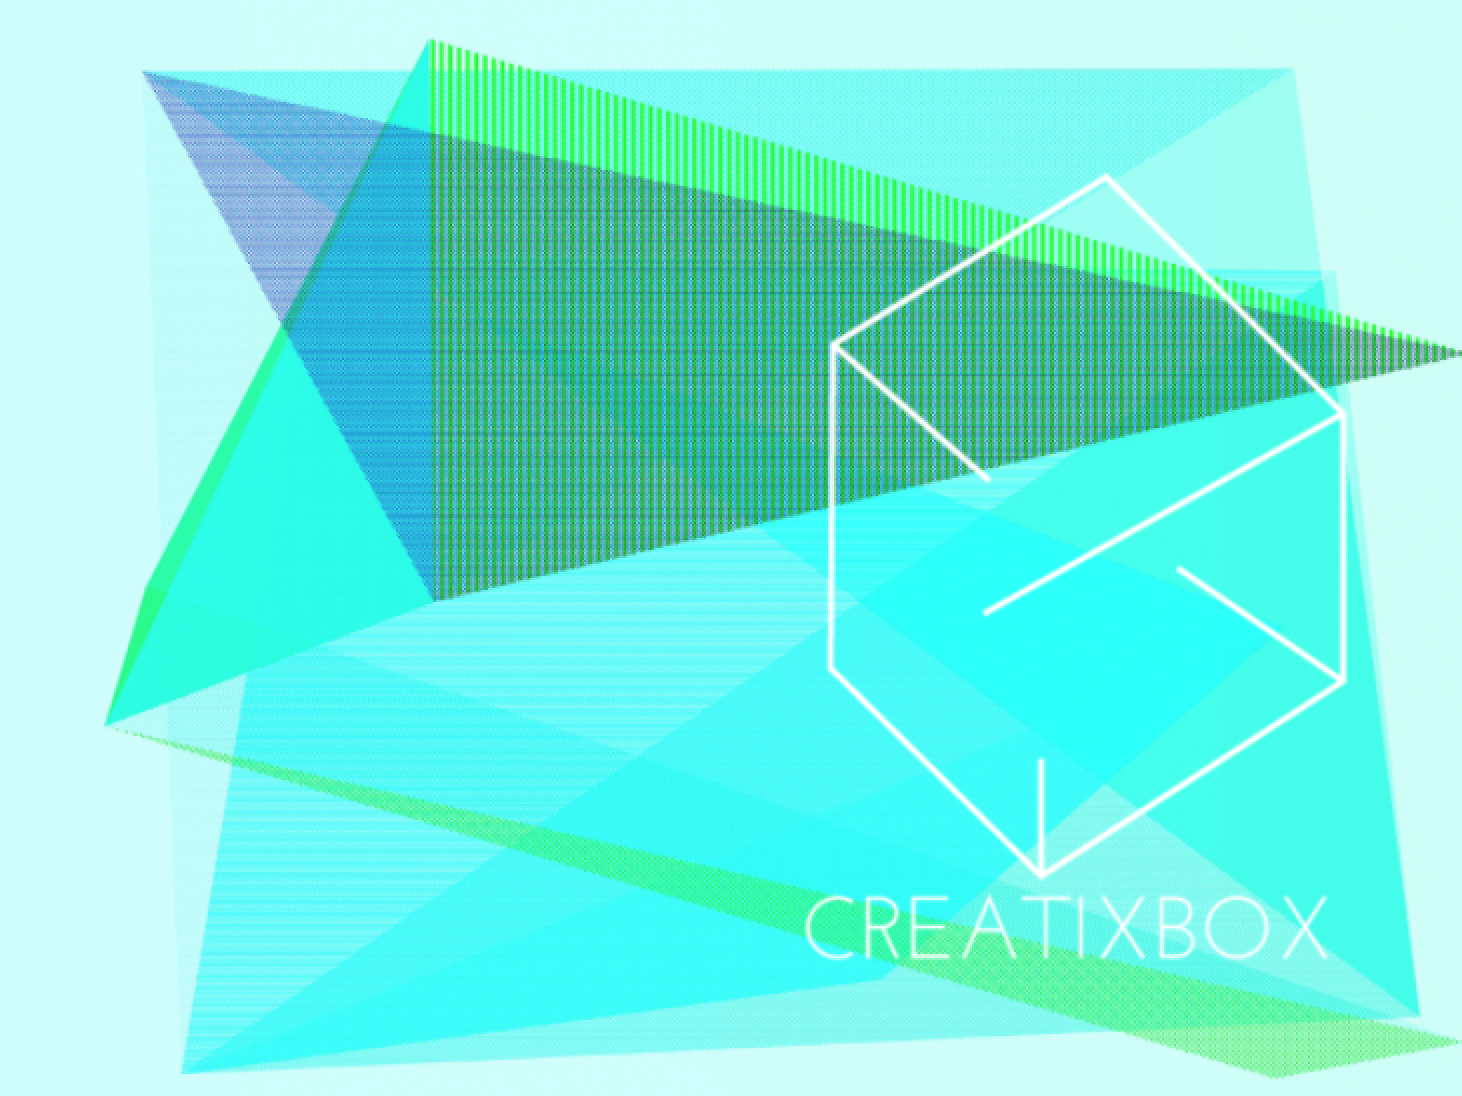 CreatixBox Green.png